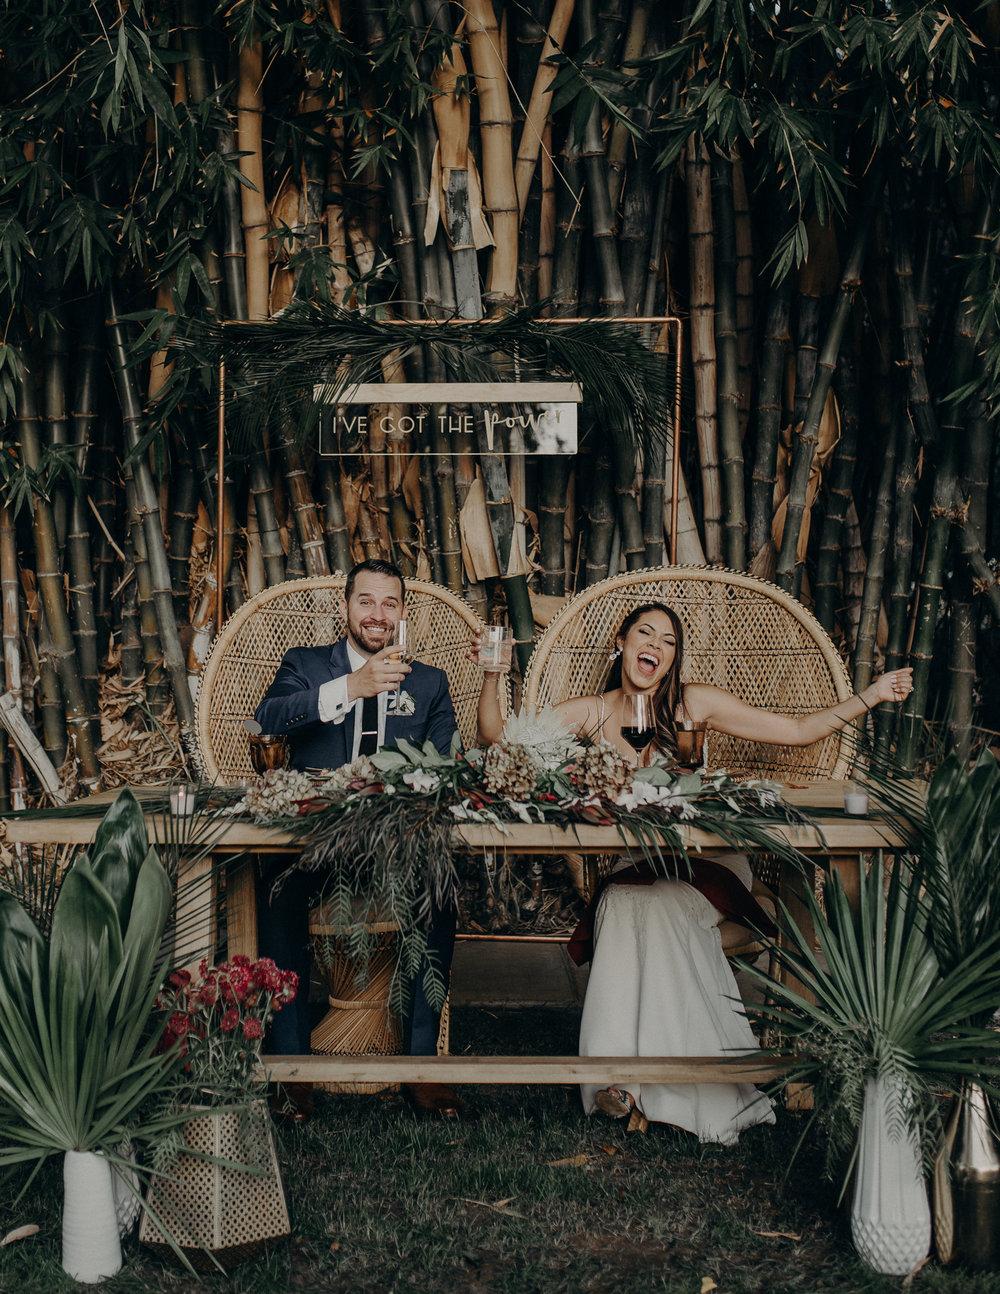 wedding photographer in los angeles - clarke estate wedding